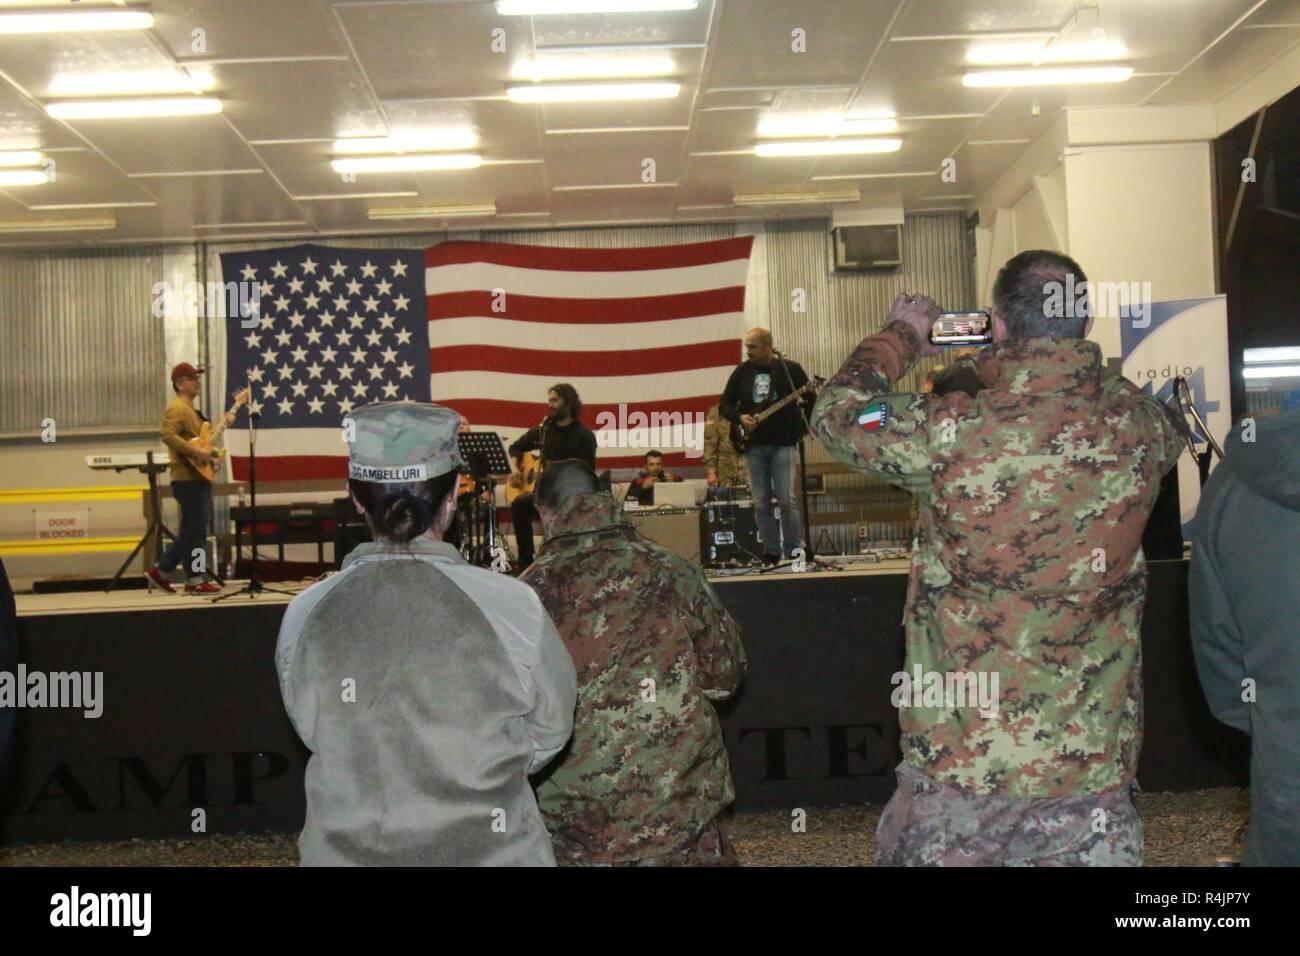 CAMP BONDSTEEL, Kosovo -- Soldiers, civilians, Kosovar